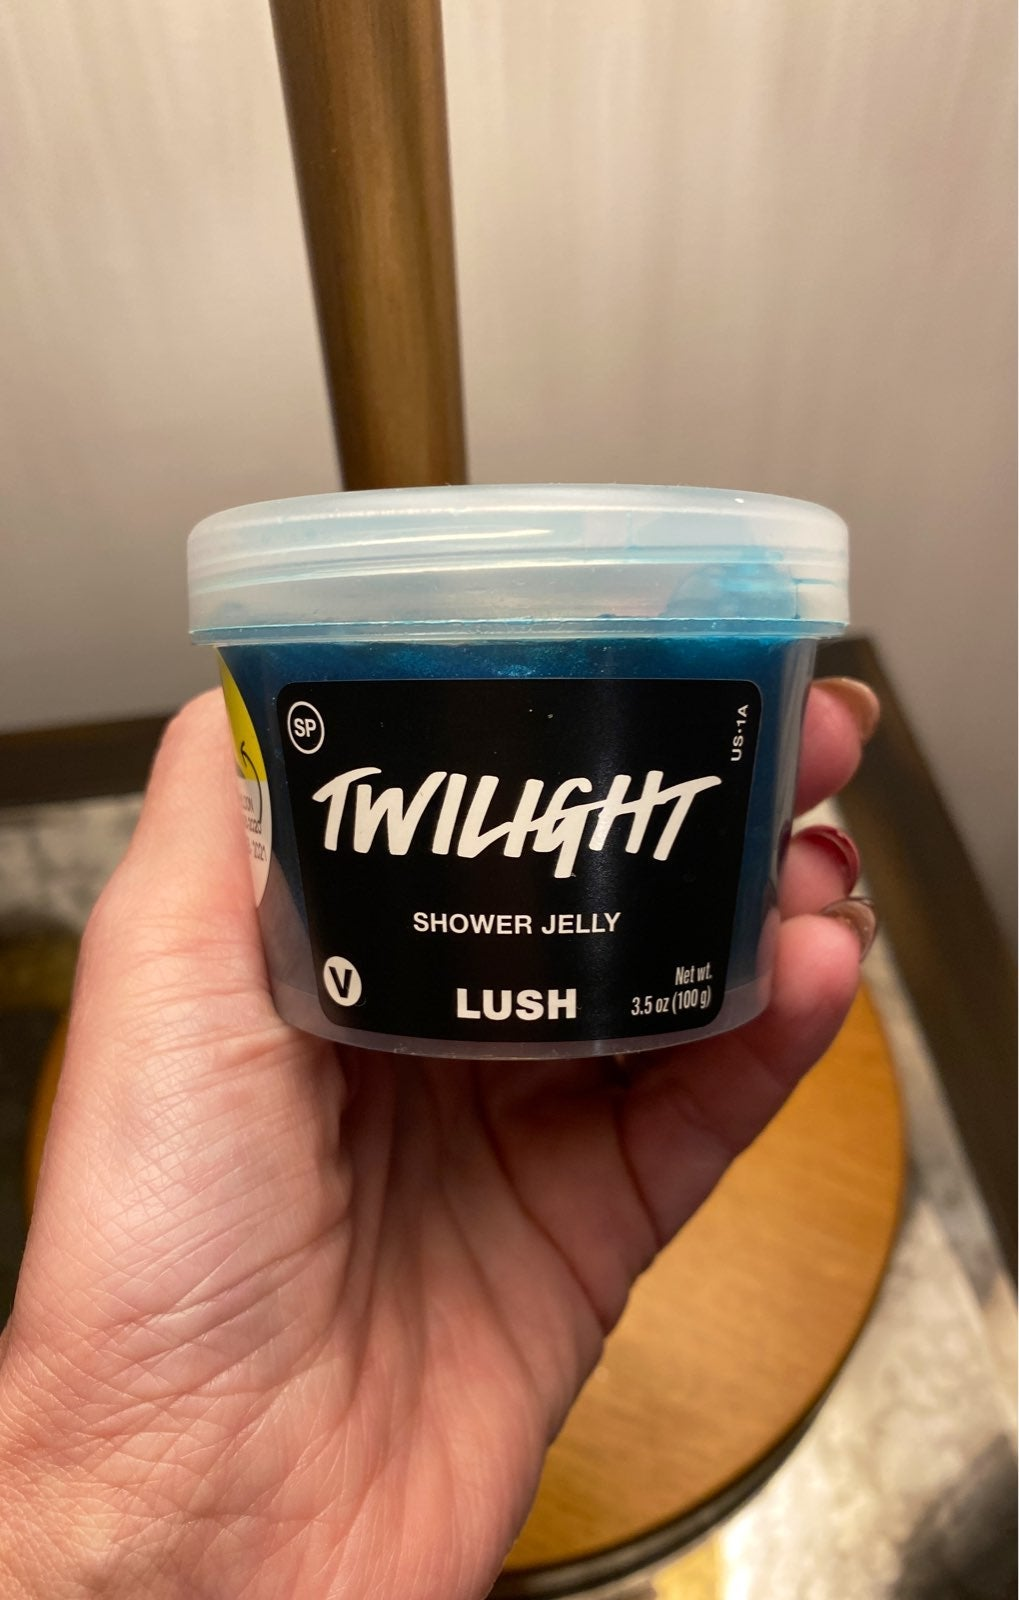 LUSH New 3.5oz TWILIGHT Shower Jelly